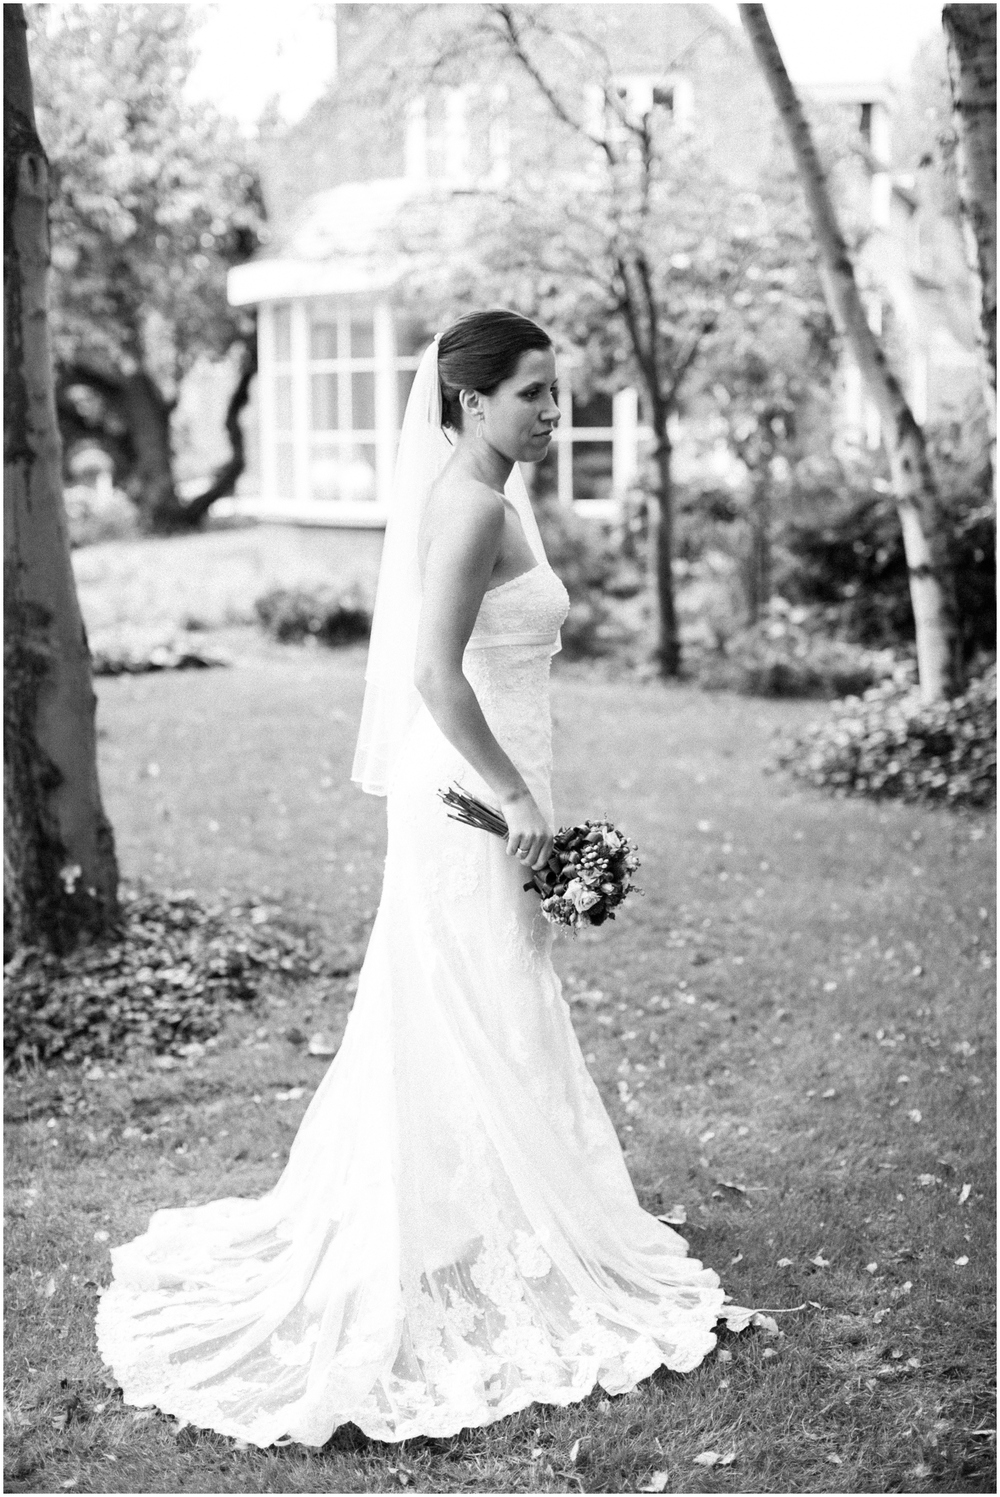 huwelijksfotograaf-hulst-nederland-015.jpg